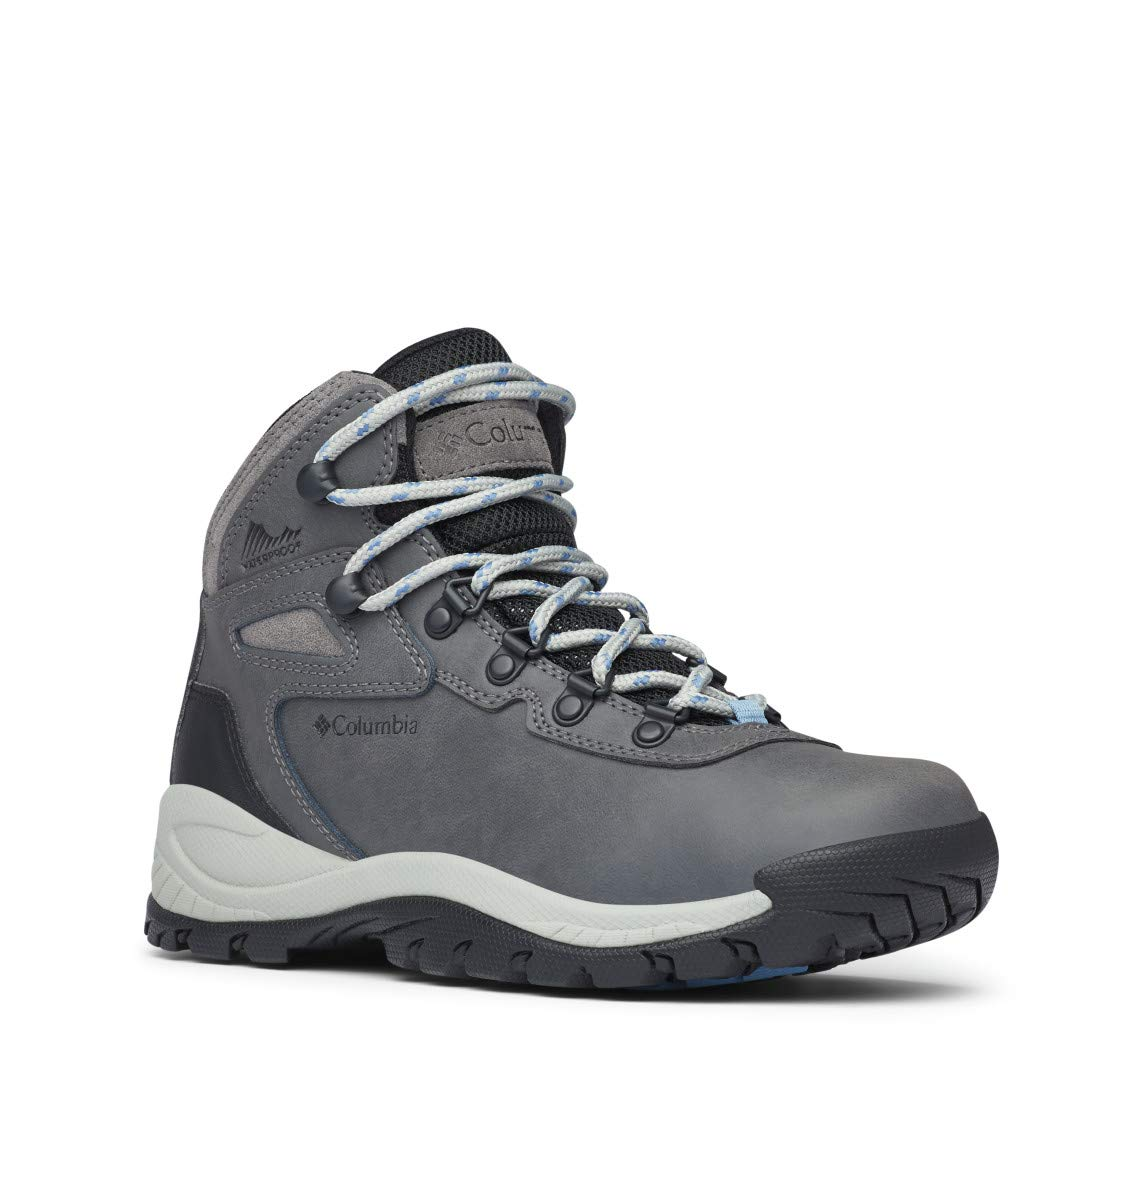 Columbia Women's Newton Ridge Plus Hiking Boot, Quarry/Cool Wave, 8.5 Regular US by Columbia